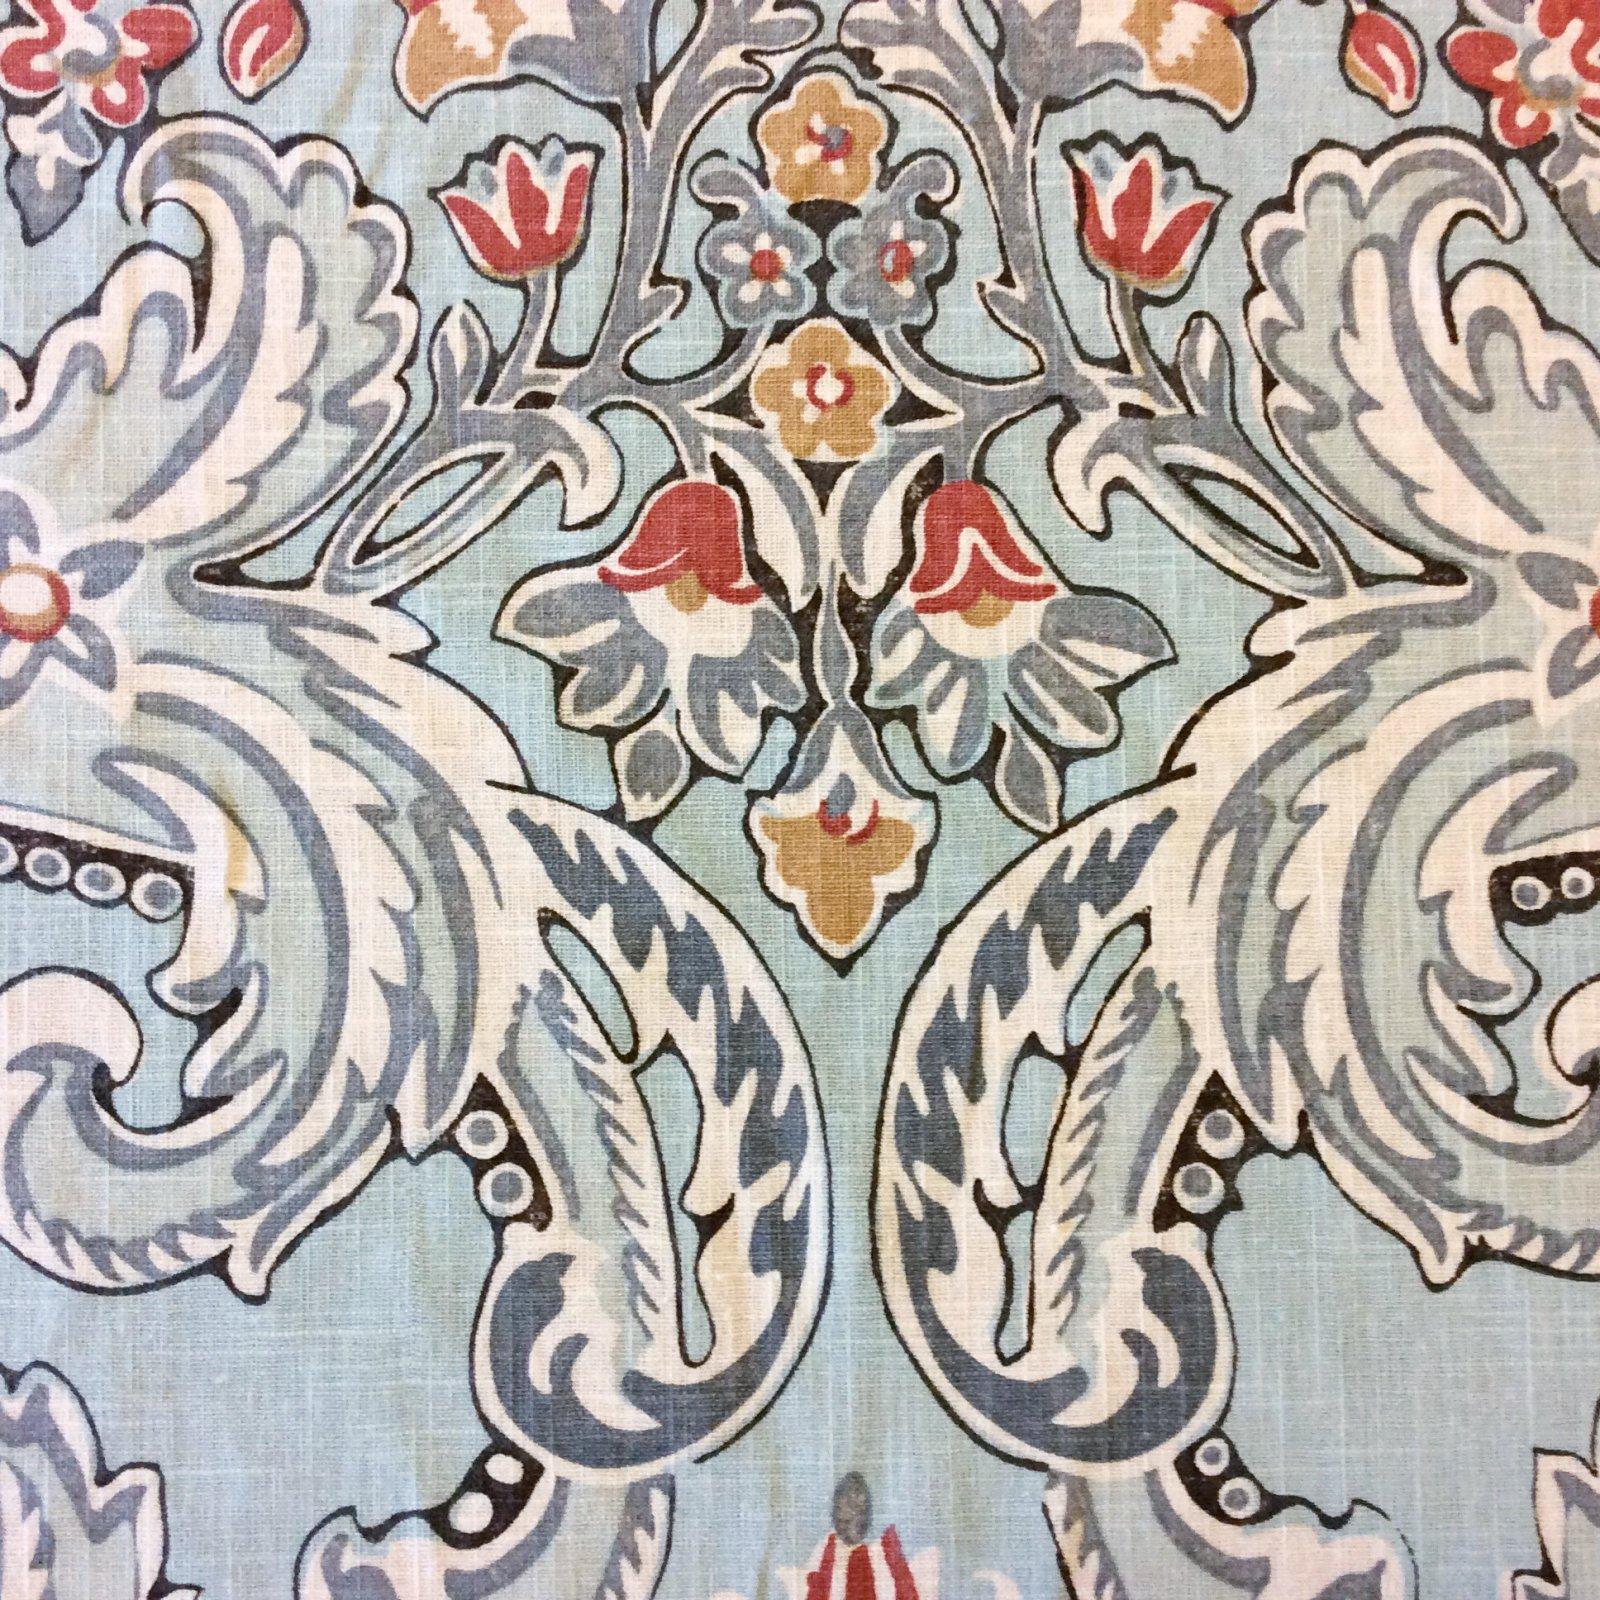 Kravet Lutron Floral Block Print Style Linen Weave Heavy Weight Textured Cotton Fabric HD506